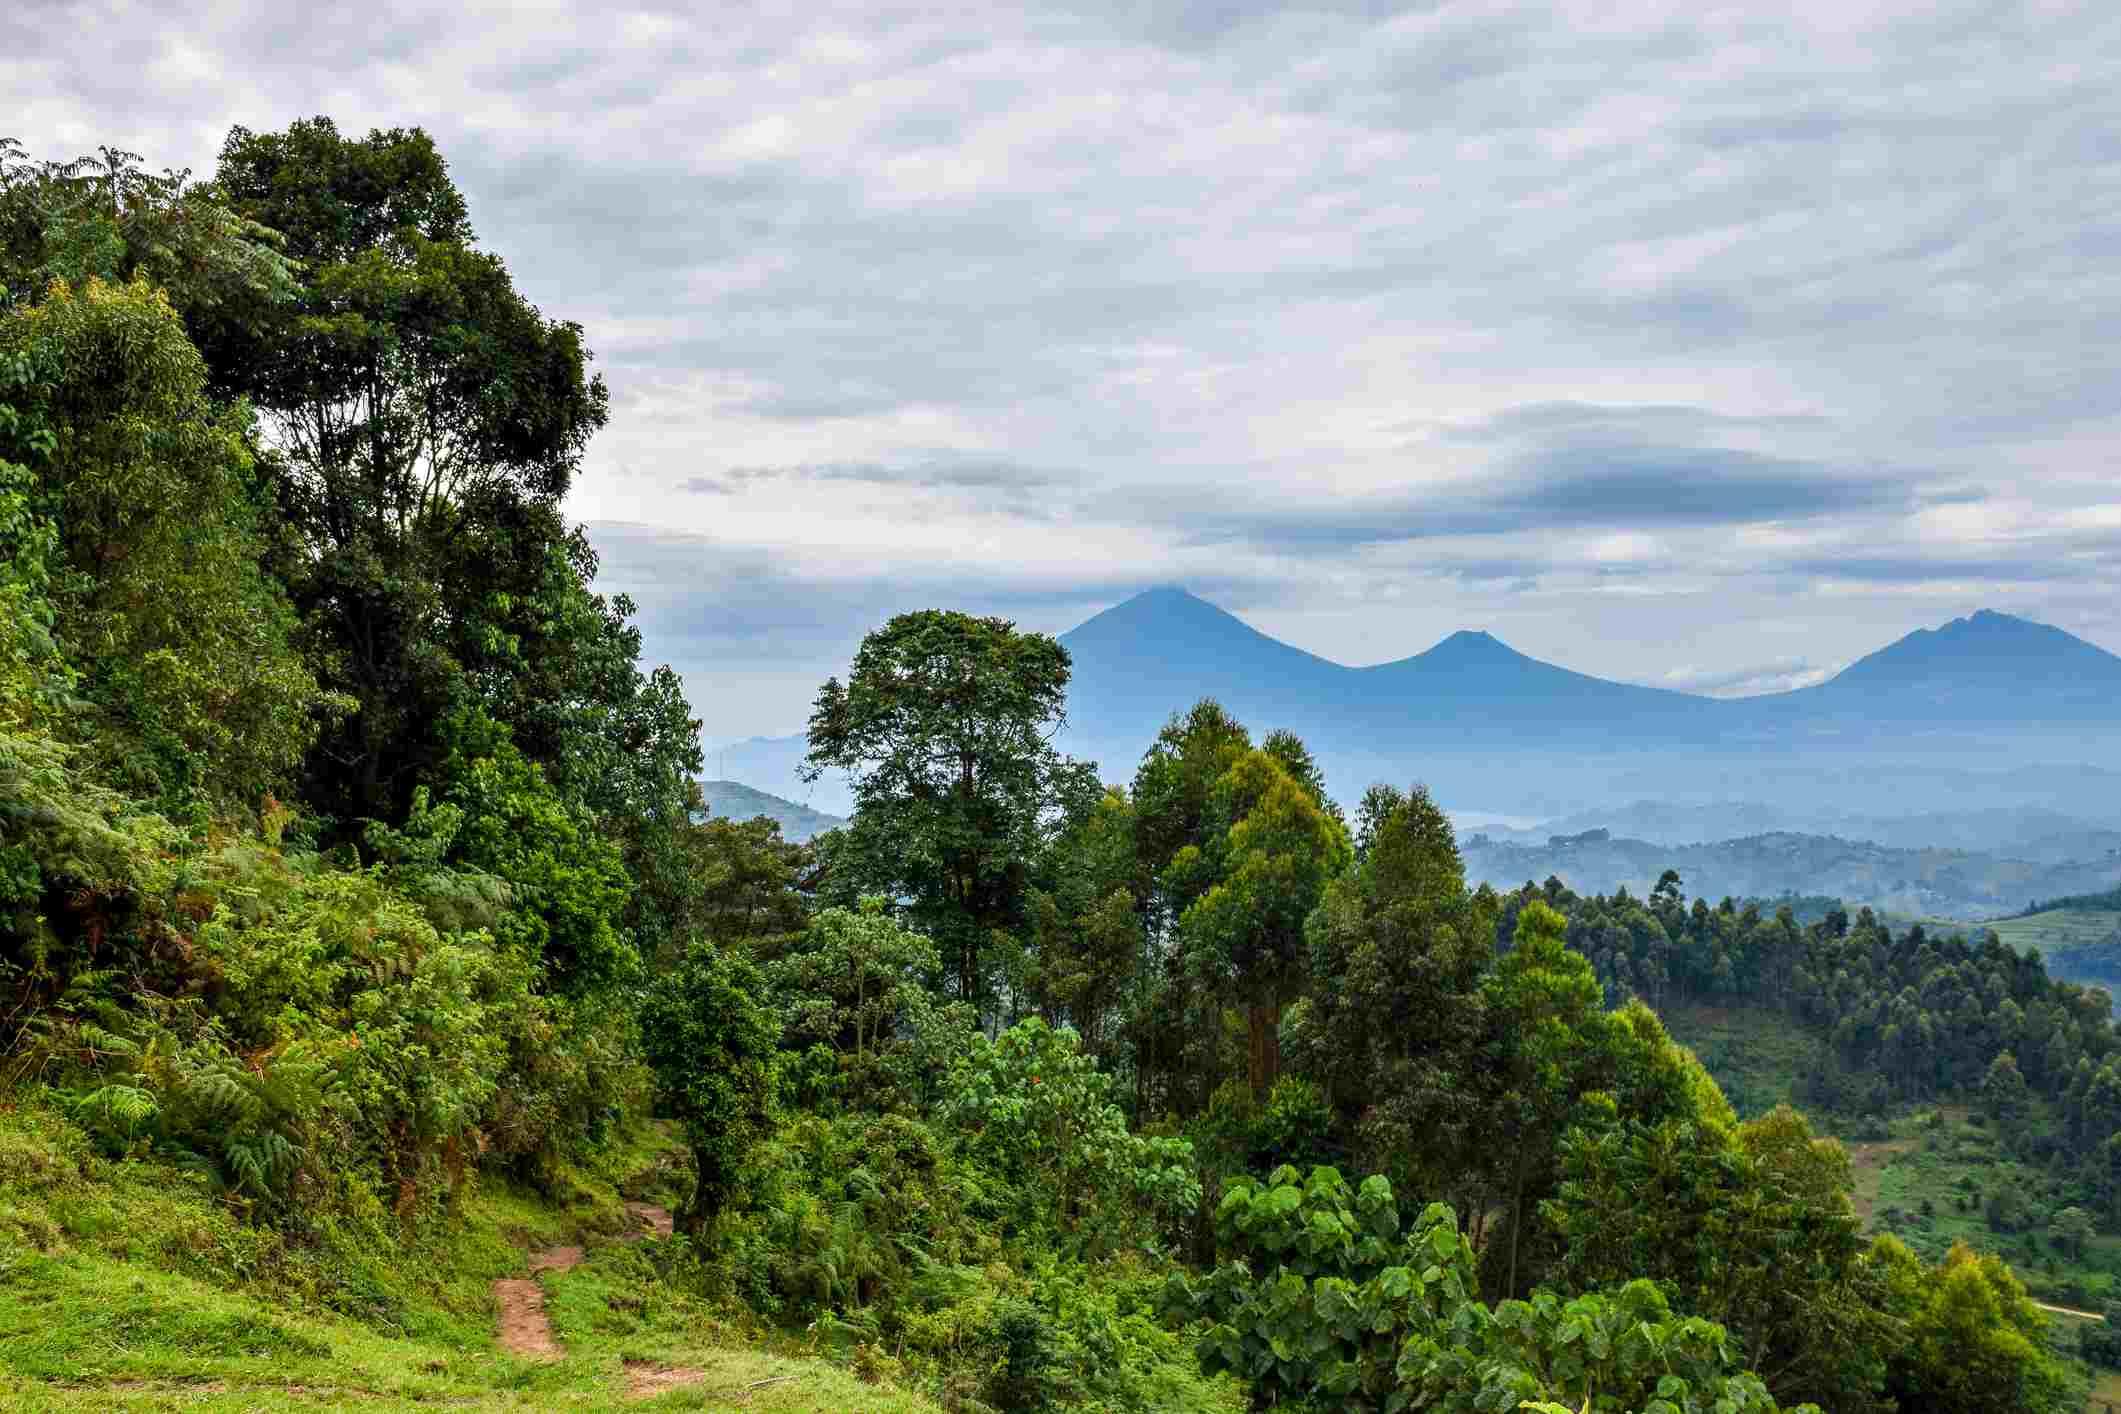 one of the highest peaks in Bwindi National Park in Uganda, looking toward the Virunga Mountains in Rwanda.